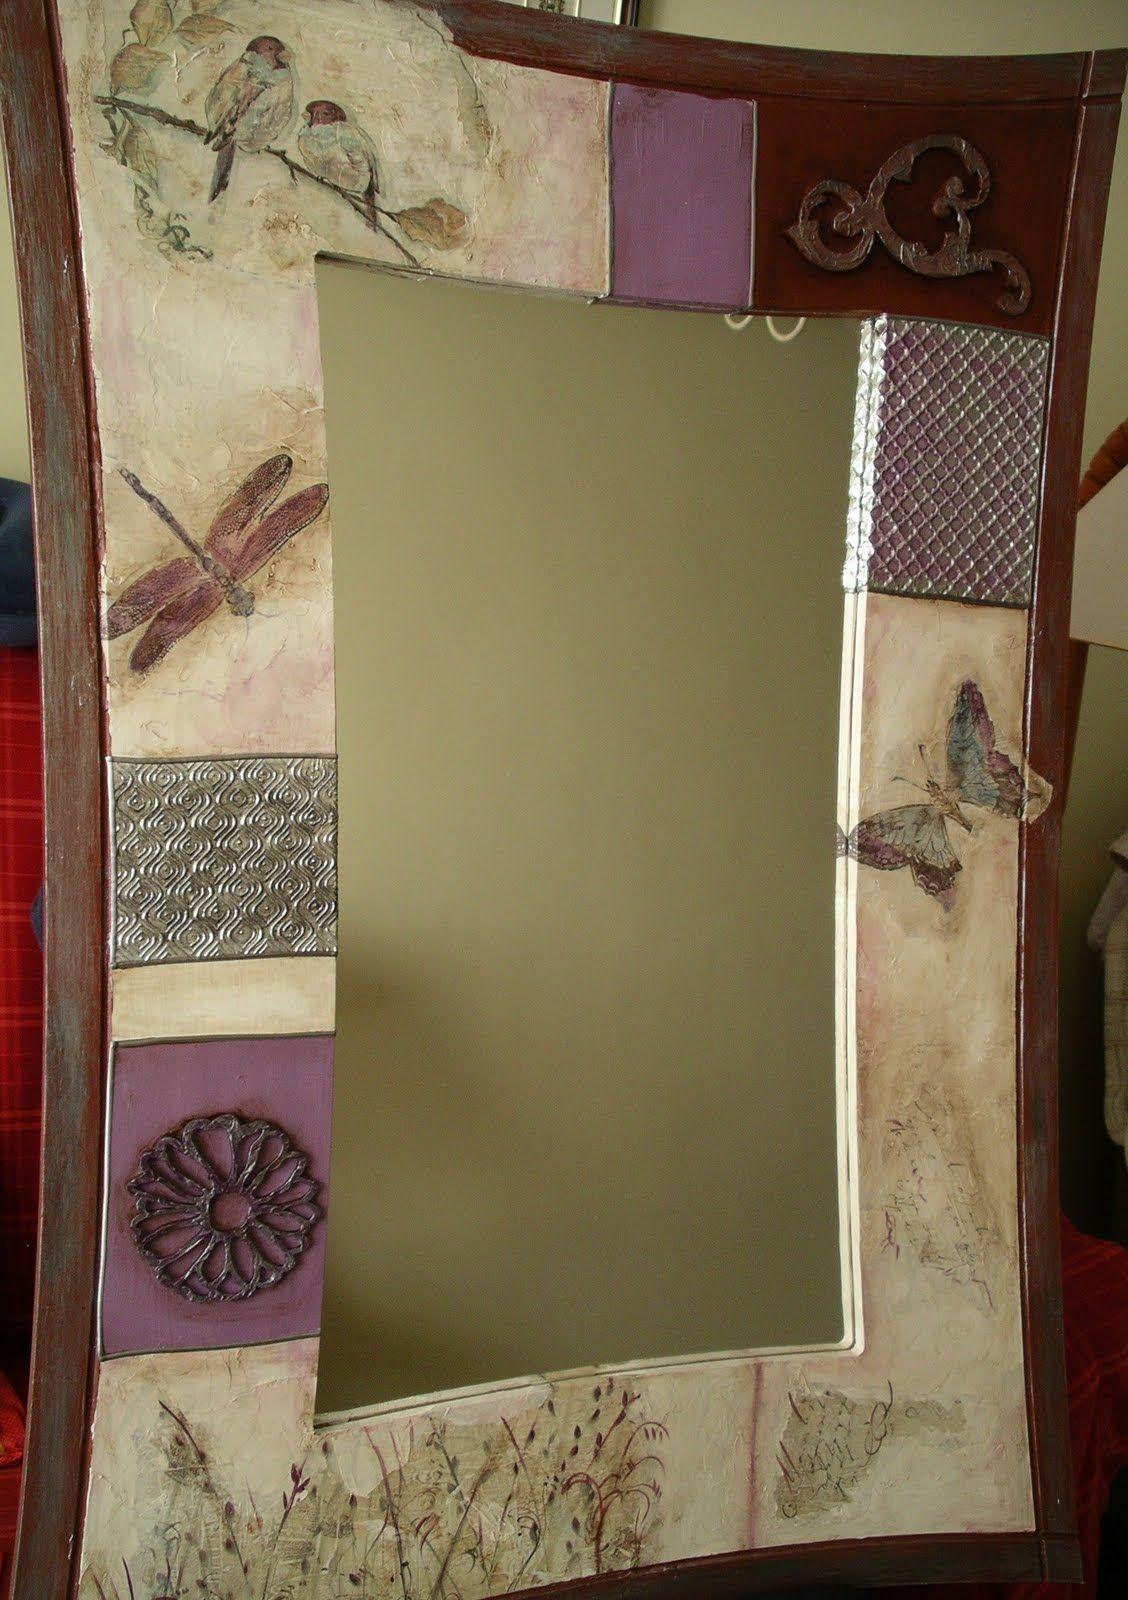 9877641bf892cc5d94150fb98a20cca1.jpg (1128×1600) | ogledala ...